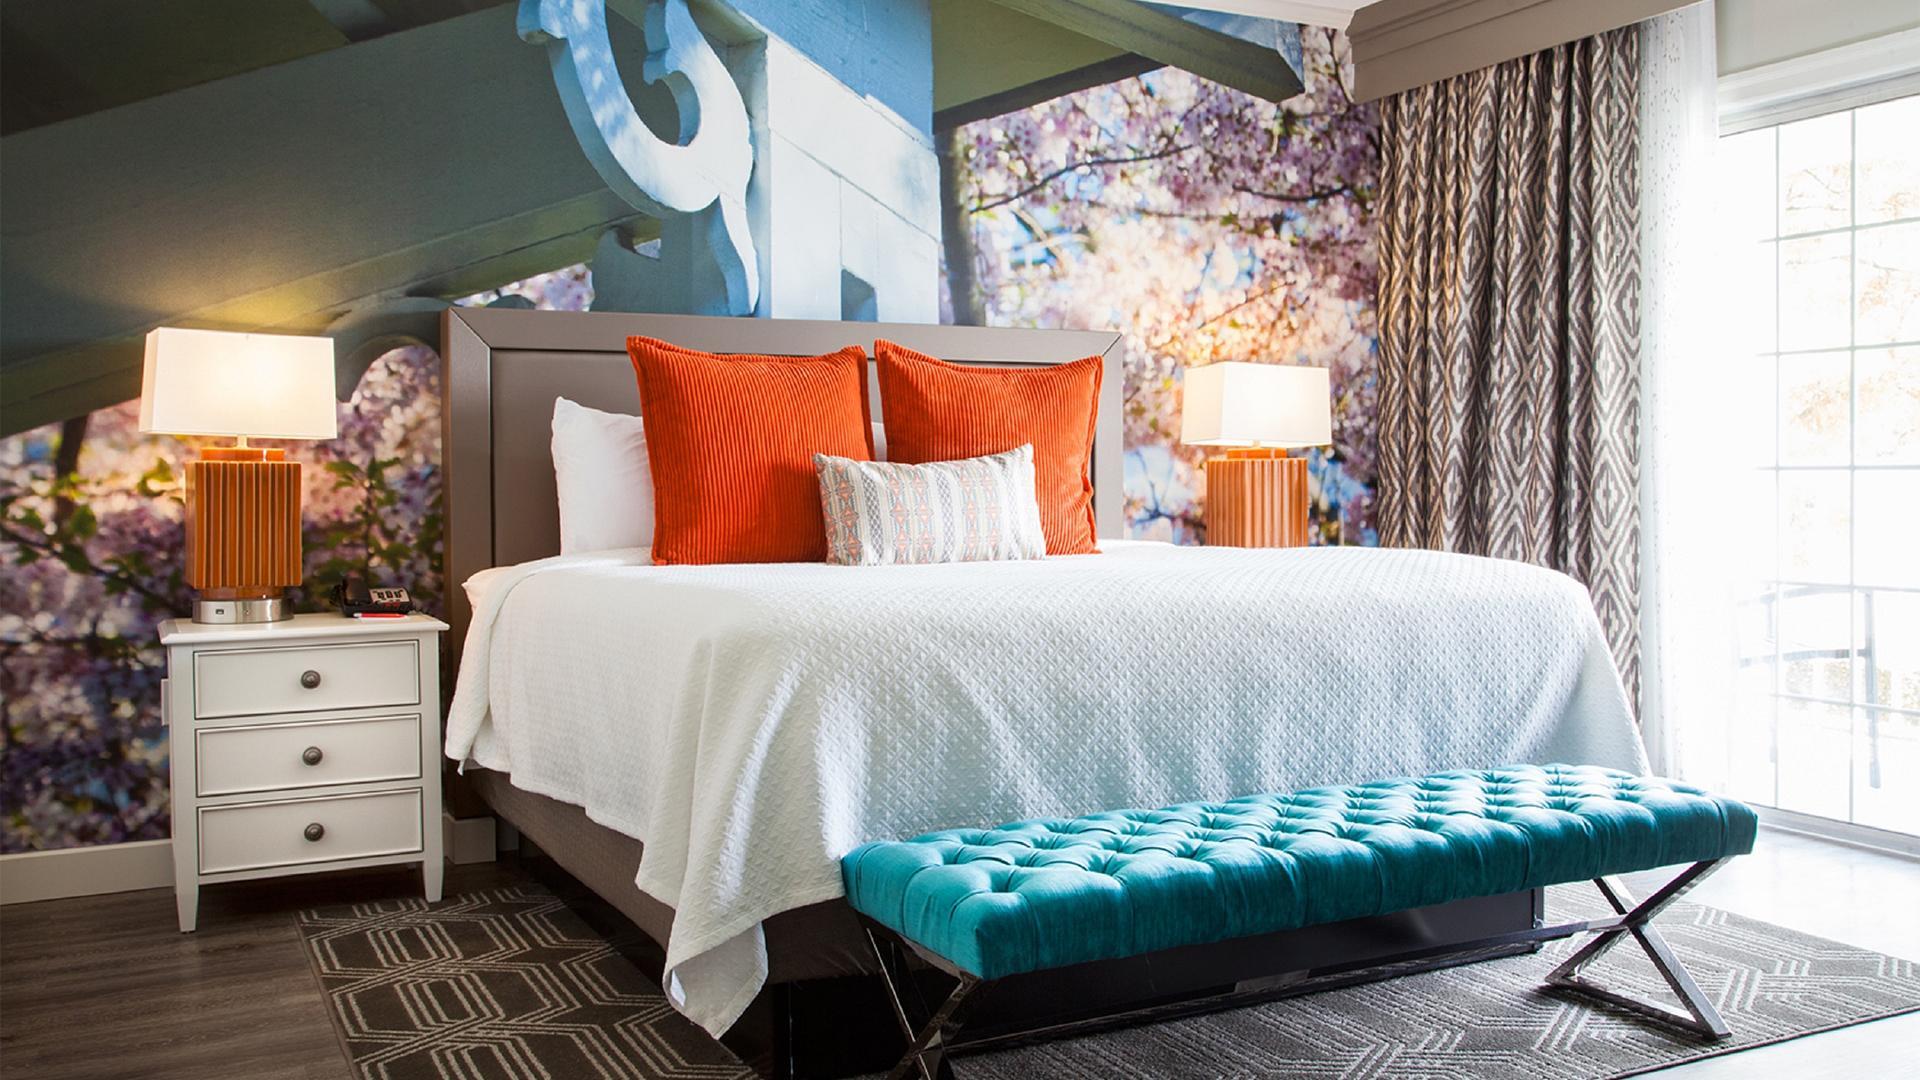 King Executive Suite image 1 at Hotel Indigo Atlanta – Vinings by Cobb County, Georgia, United States